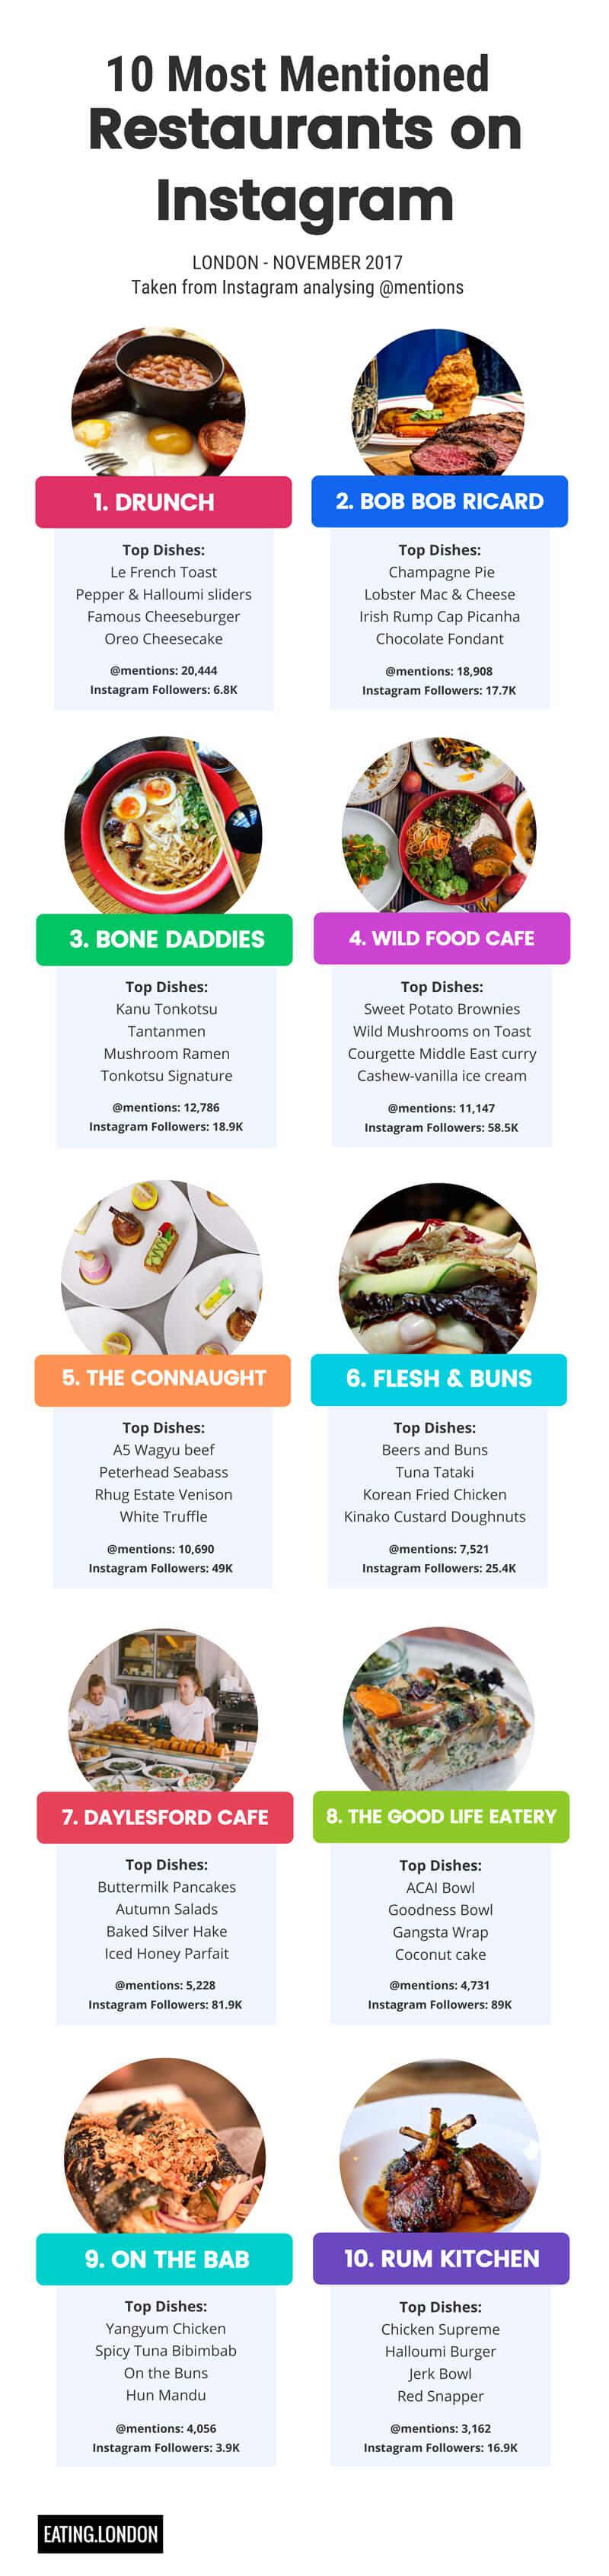 10 Most Mentioned Restaurants on Instagram